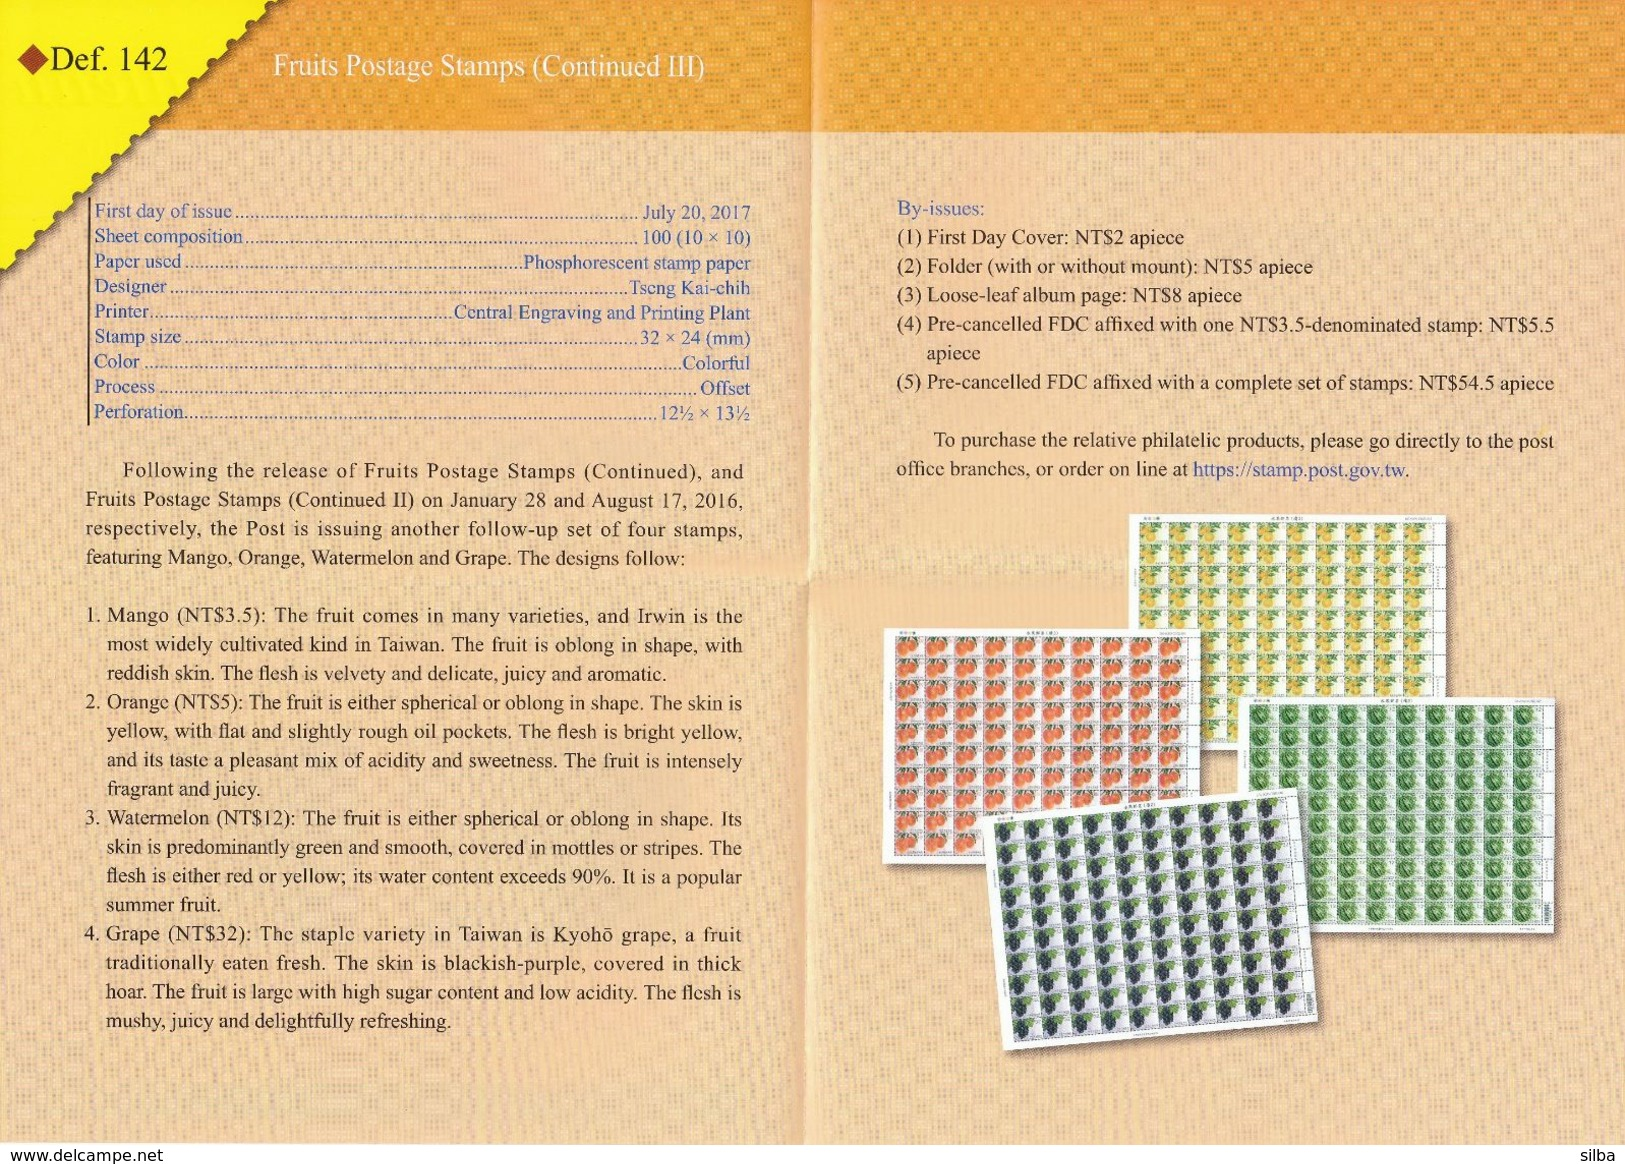 China Taiwan 2017 / Philatelic Bulletin, Prospectus, Leaflet, Brochure / Fruits / Mango, Orange, Watermelon, Grape - Covers & Documents